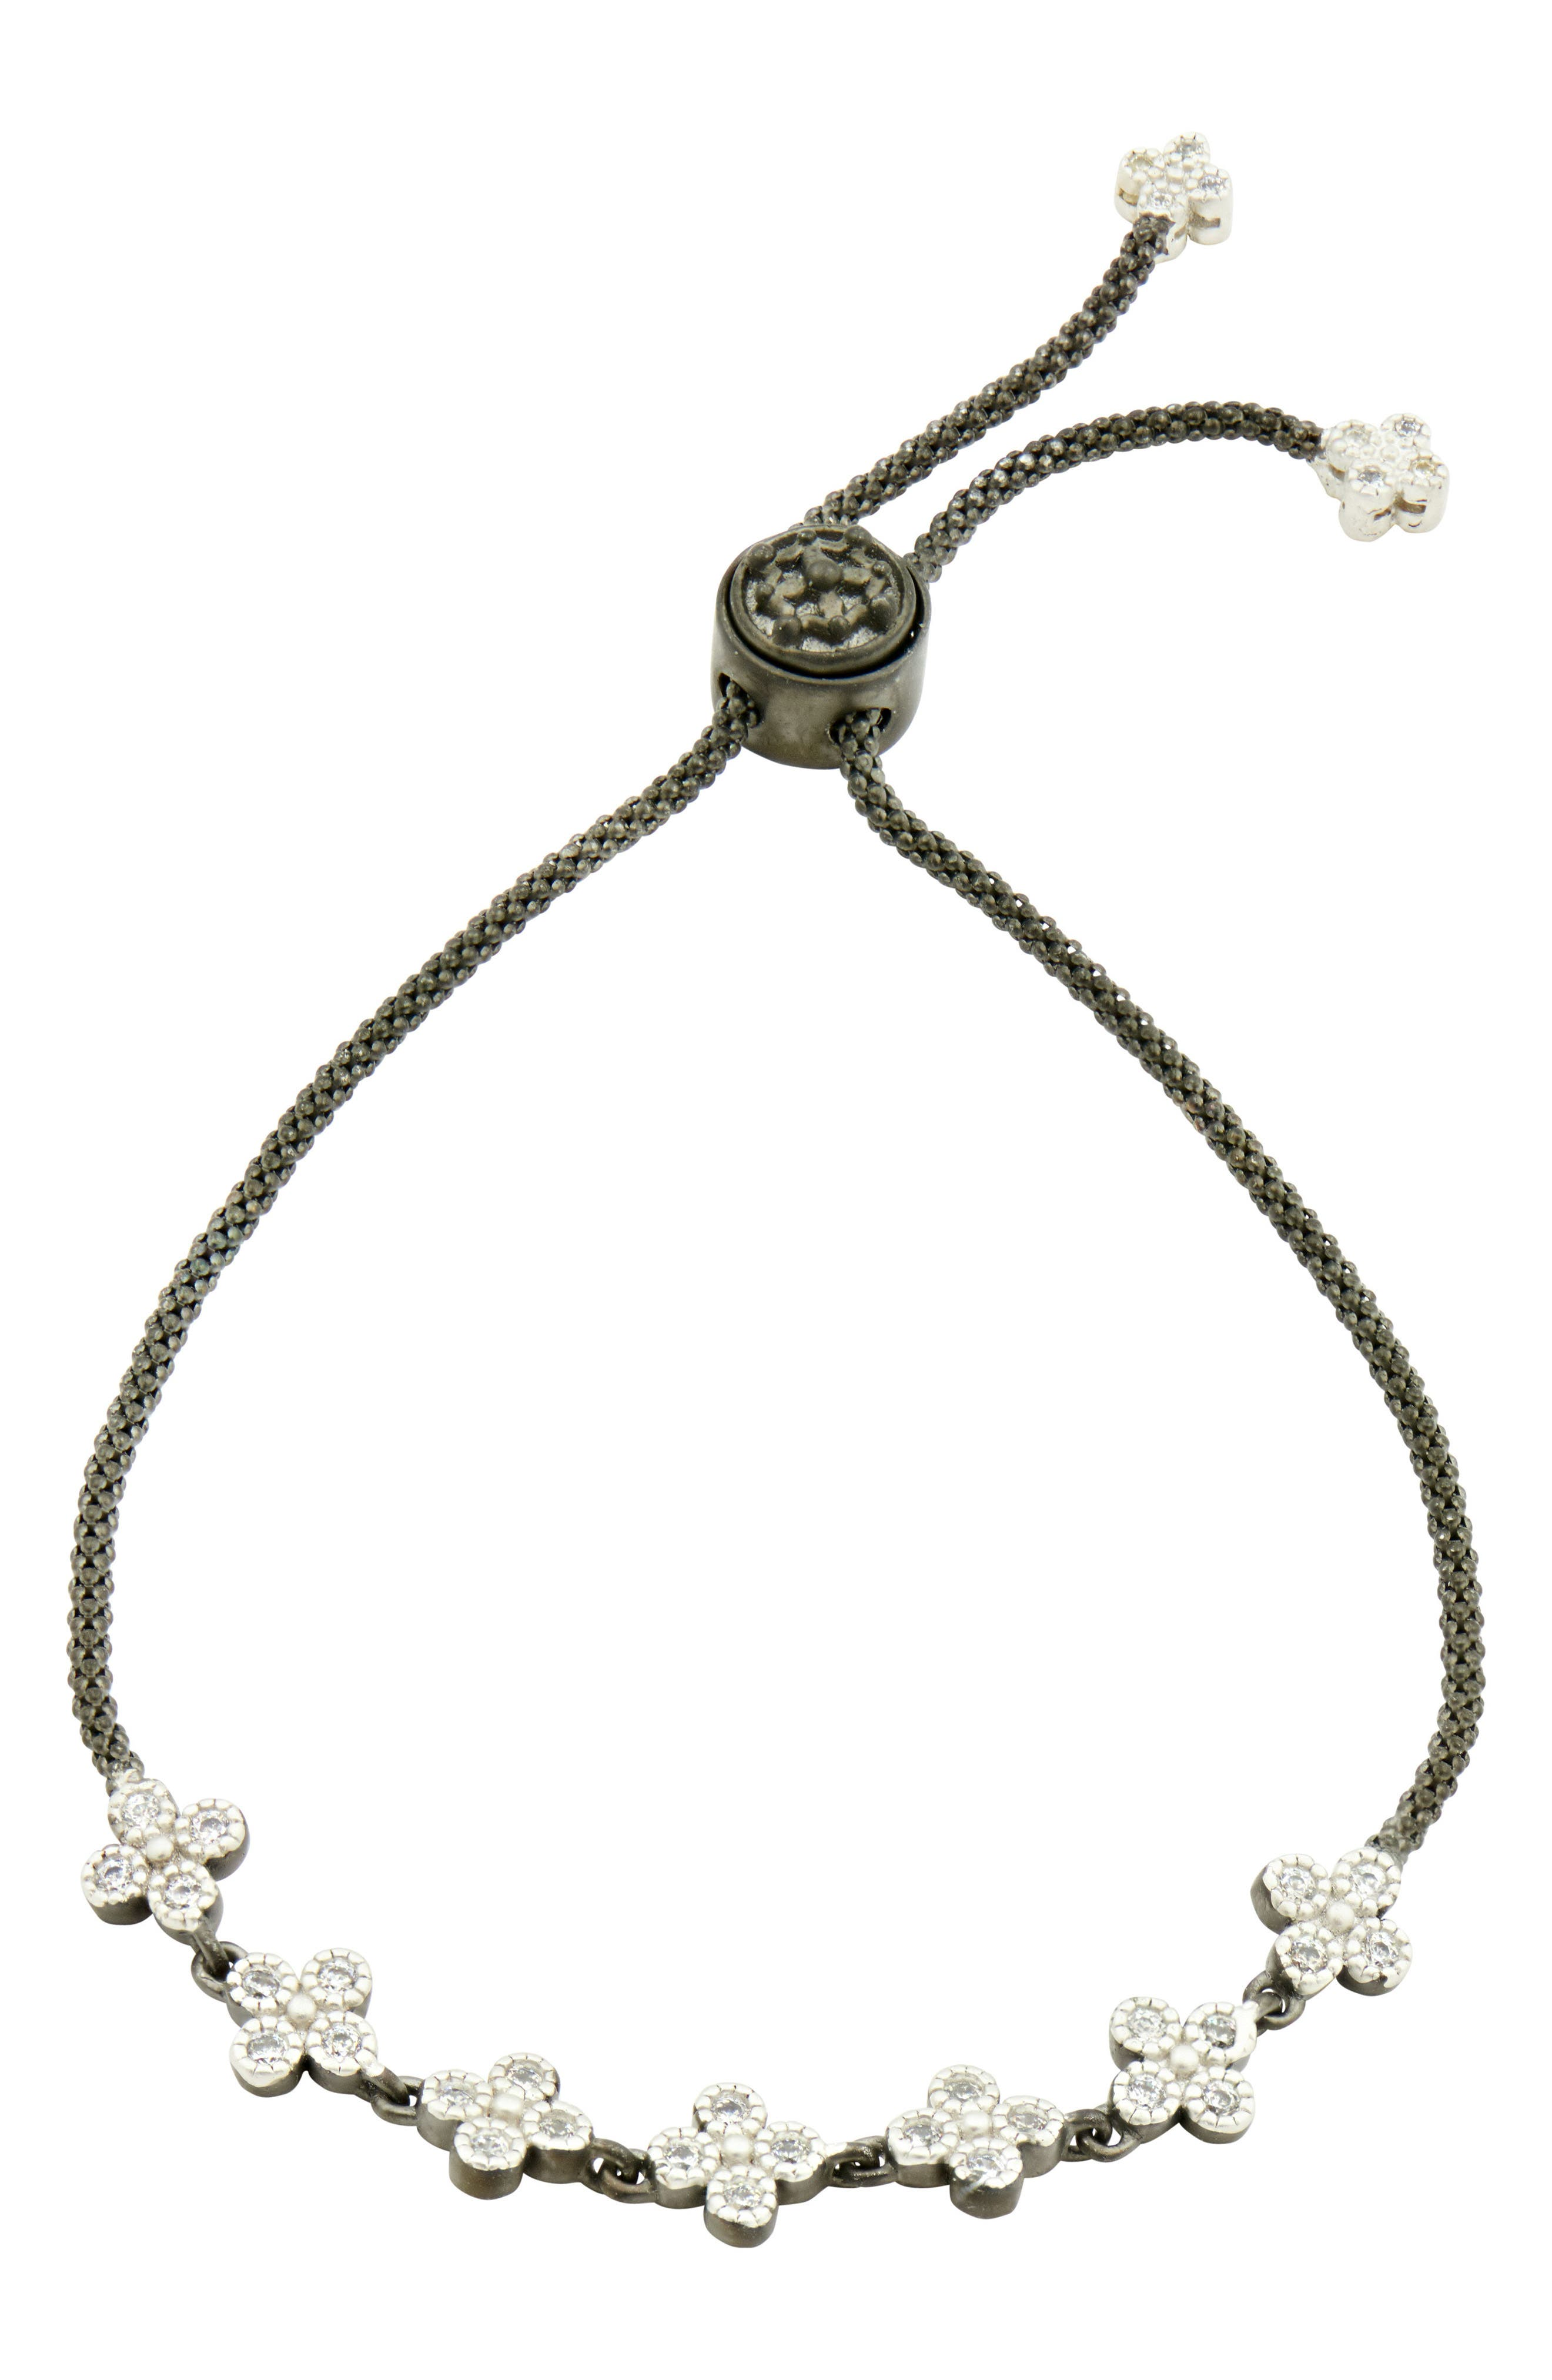 Signature Clover Adjustable Bracelet,                         Main,                         color, BLACK/ SILVER